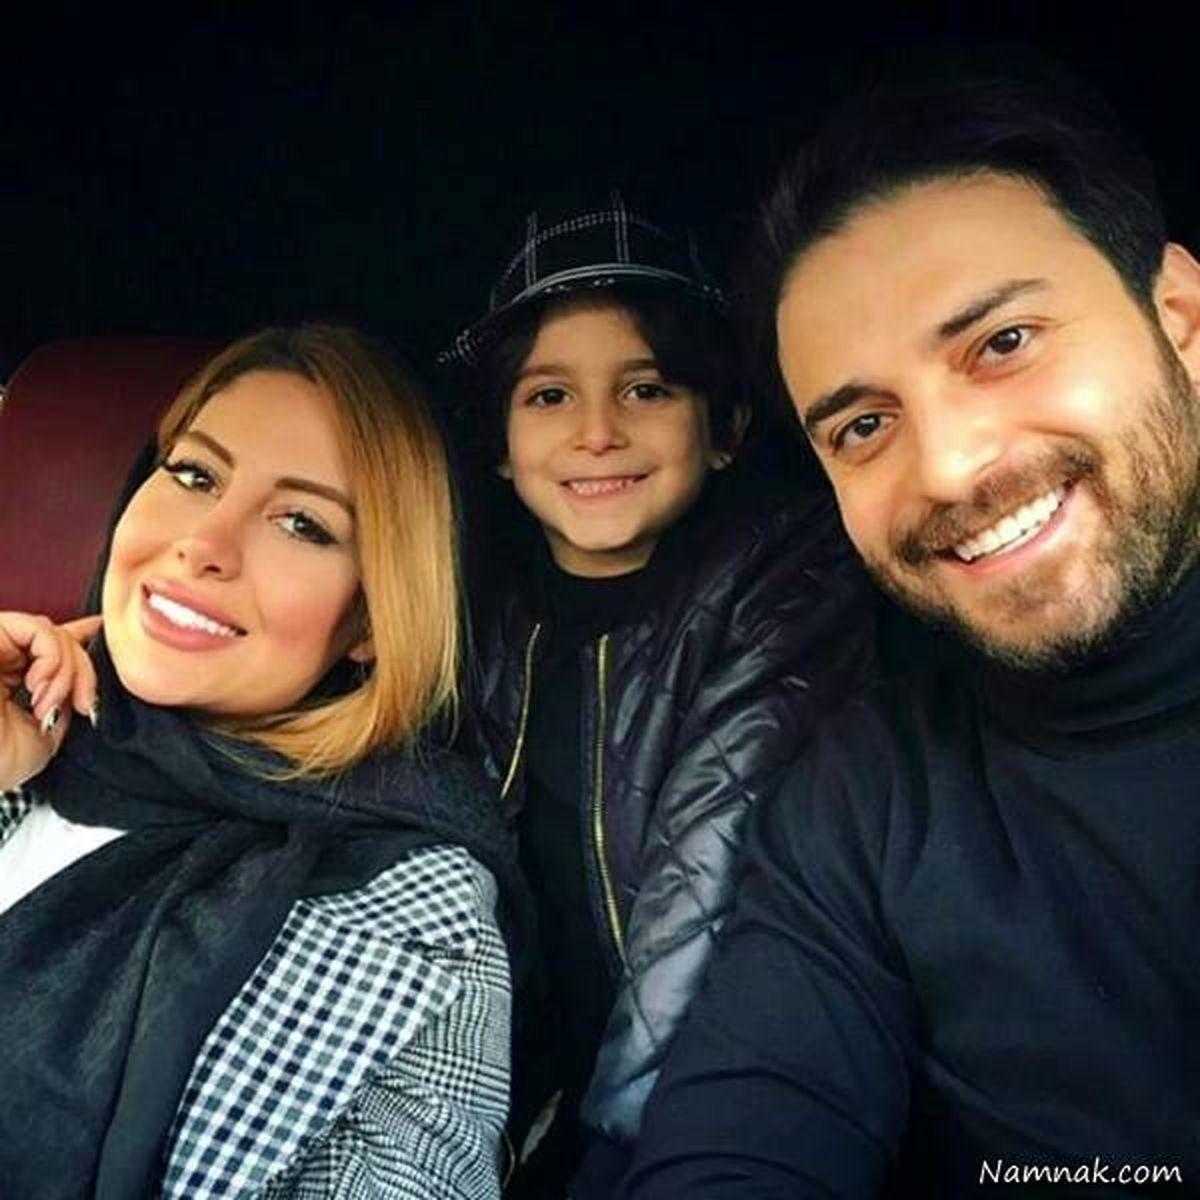 جشن تولد لاکچری پسر بابک جهانبخش در کیش + تصاویر